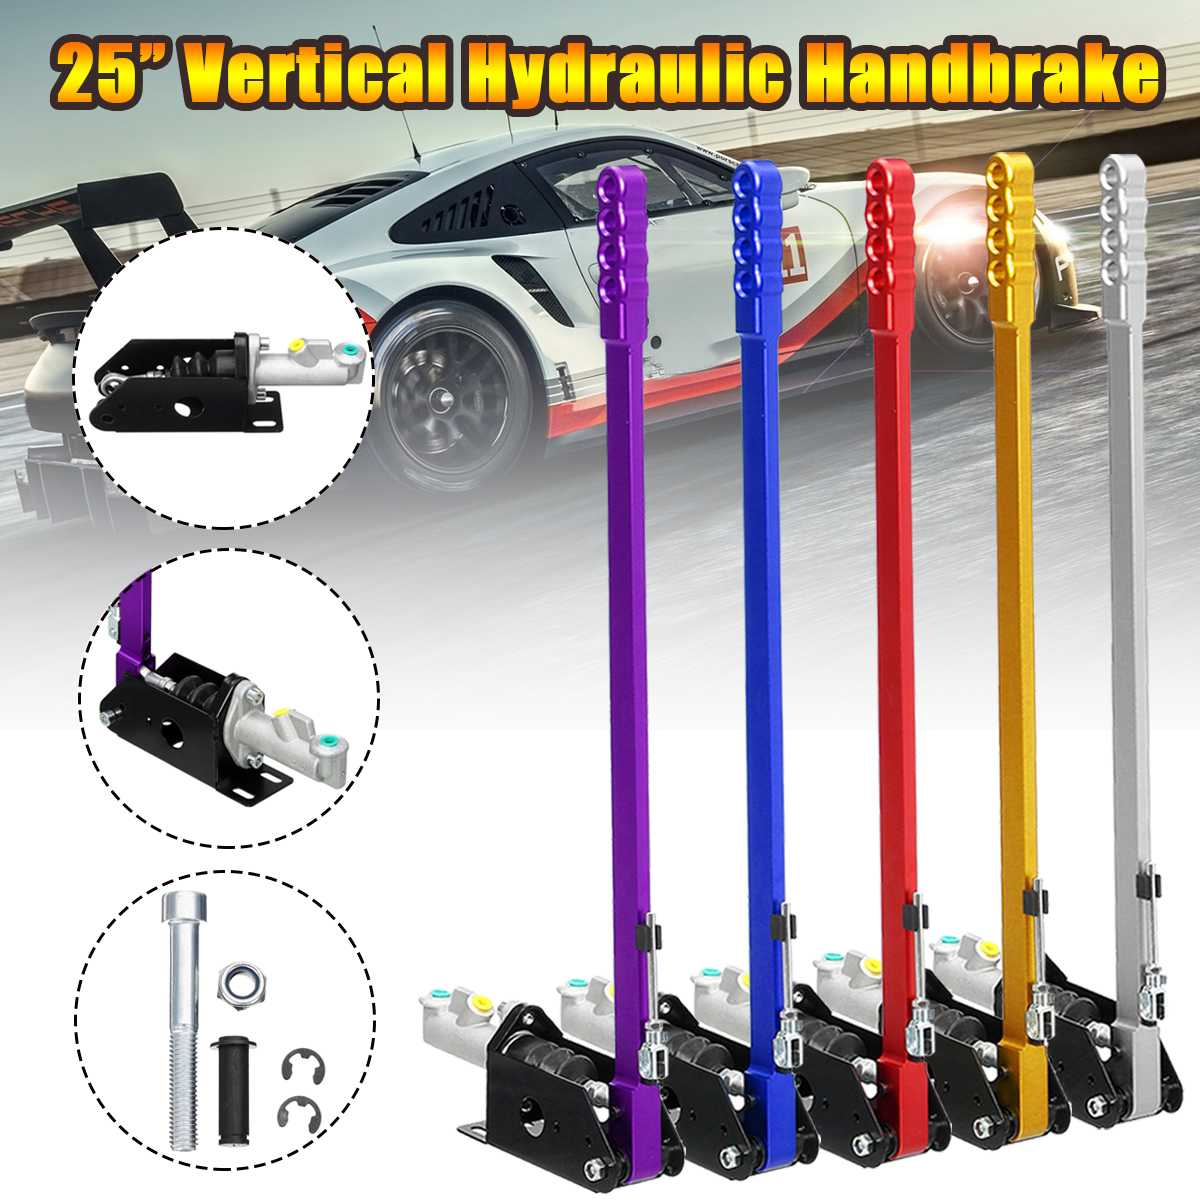 25inch 63cm Long Vertical Hydraulic Handbrake Hydro Race E-brake Drift Rally Lever Gear25inch 63cm Long Vertical Hydraulic Handbrake Hydro Race E-brake Drift Rally Lever Gear